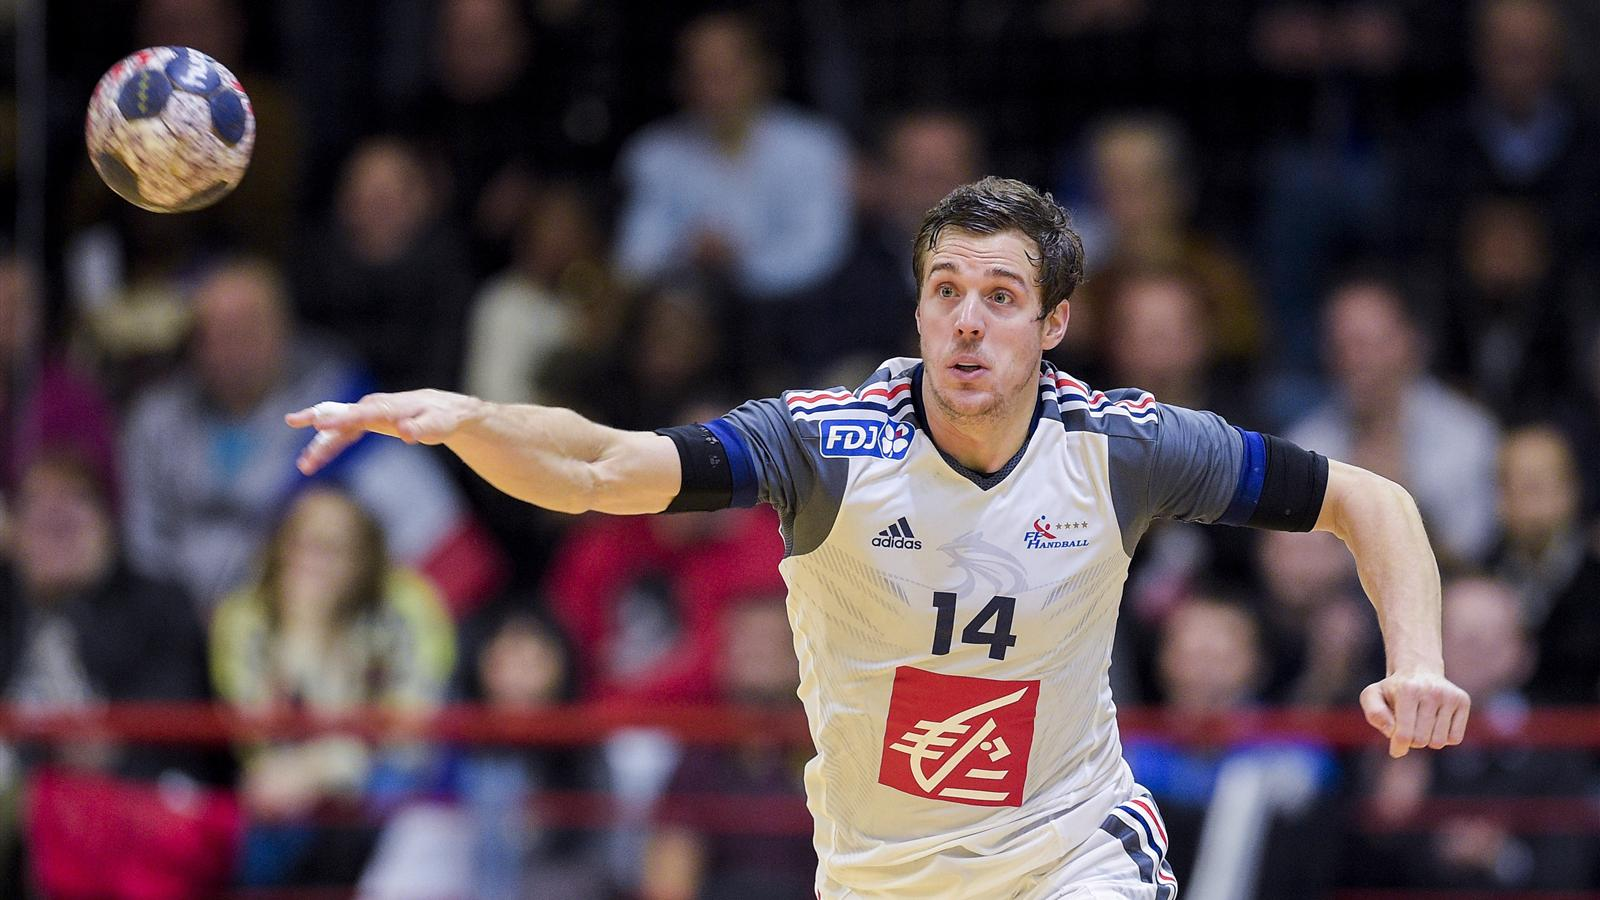 Mondial 2015 gr bille mah nyokas ces trois - Calendrier coupe du monde de handball ...